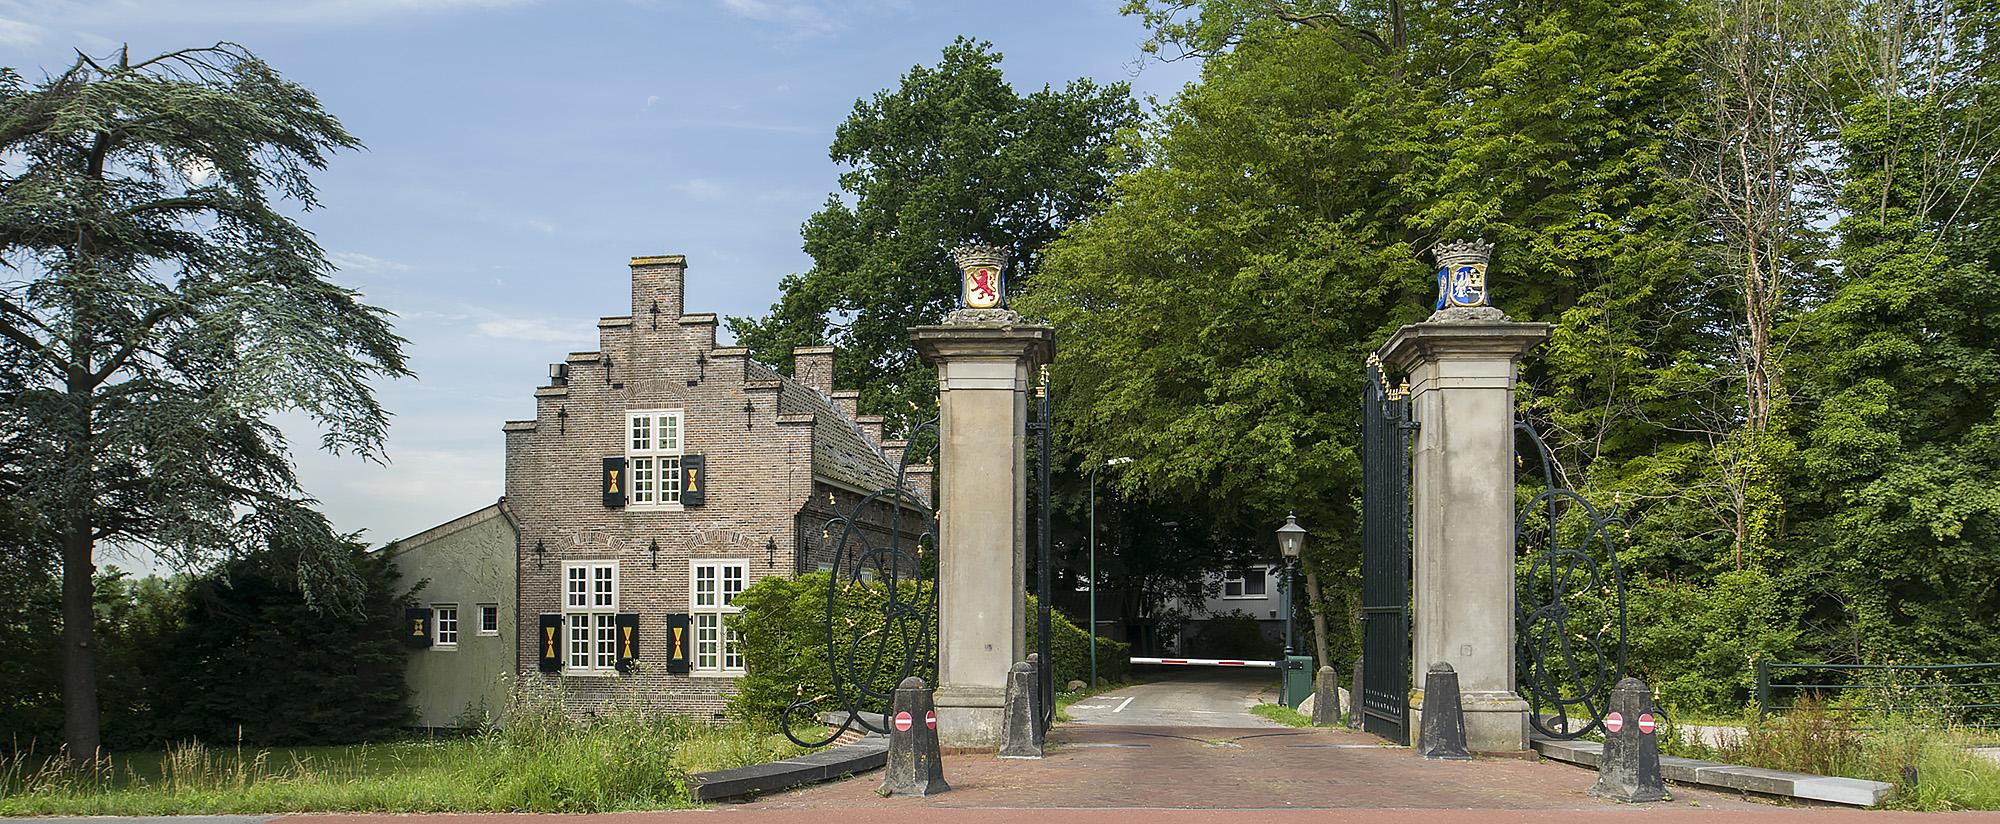 Kasteel | Landgoed Nijenrode | Monumentenfotograaf Leontine van Geffen-Lamers